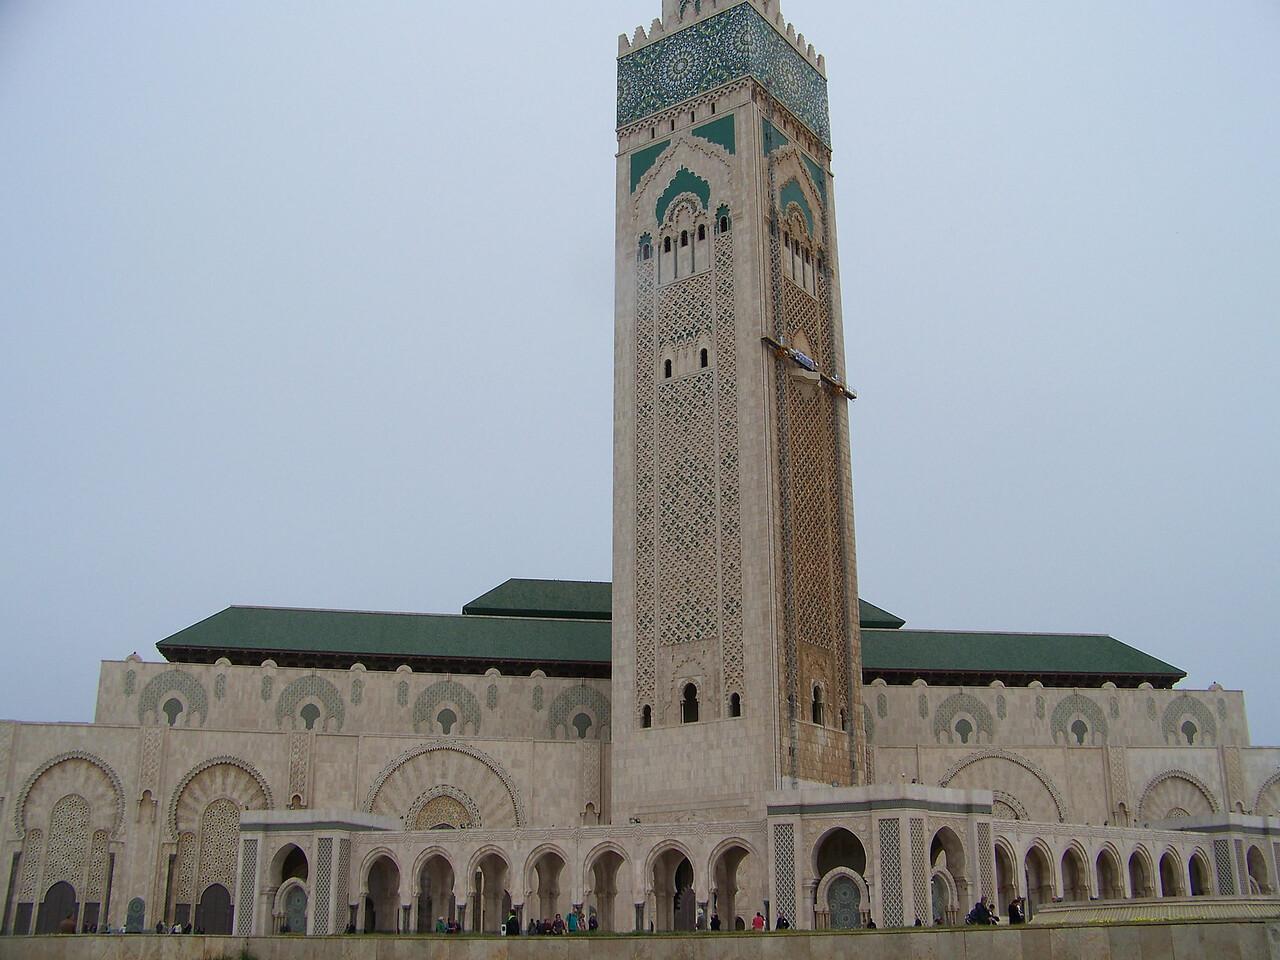 0035 - Hassan II Mosque - Casablanca Morocco.JPG